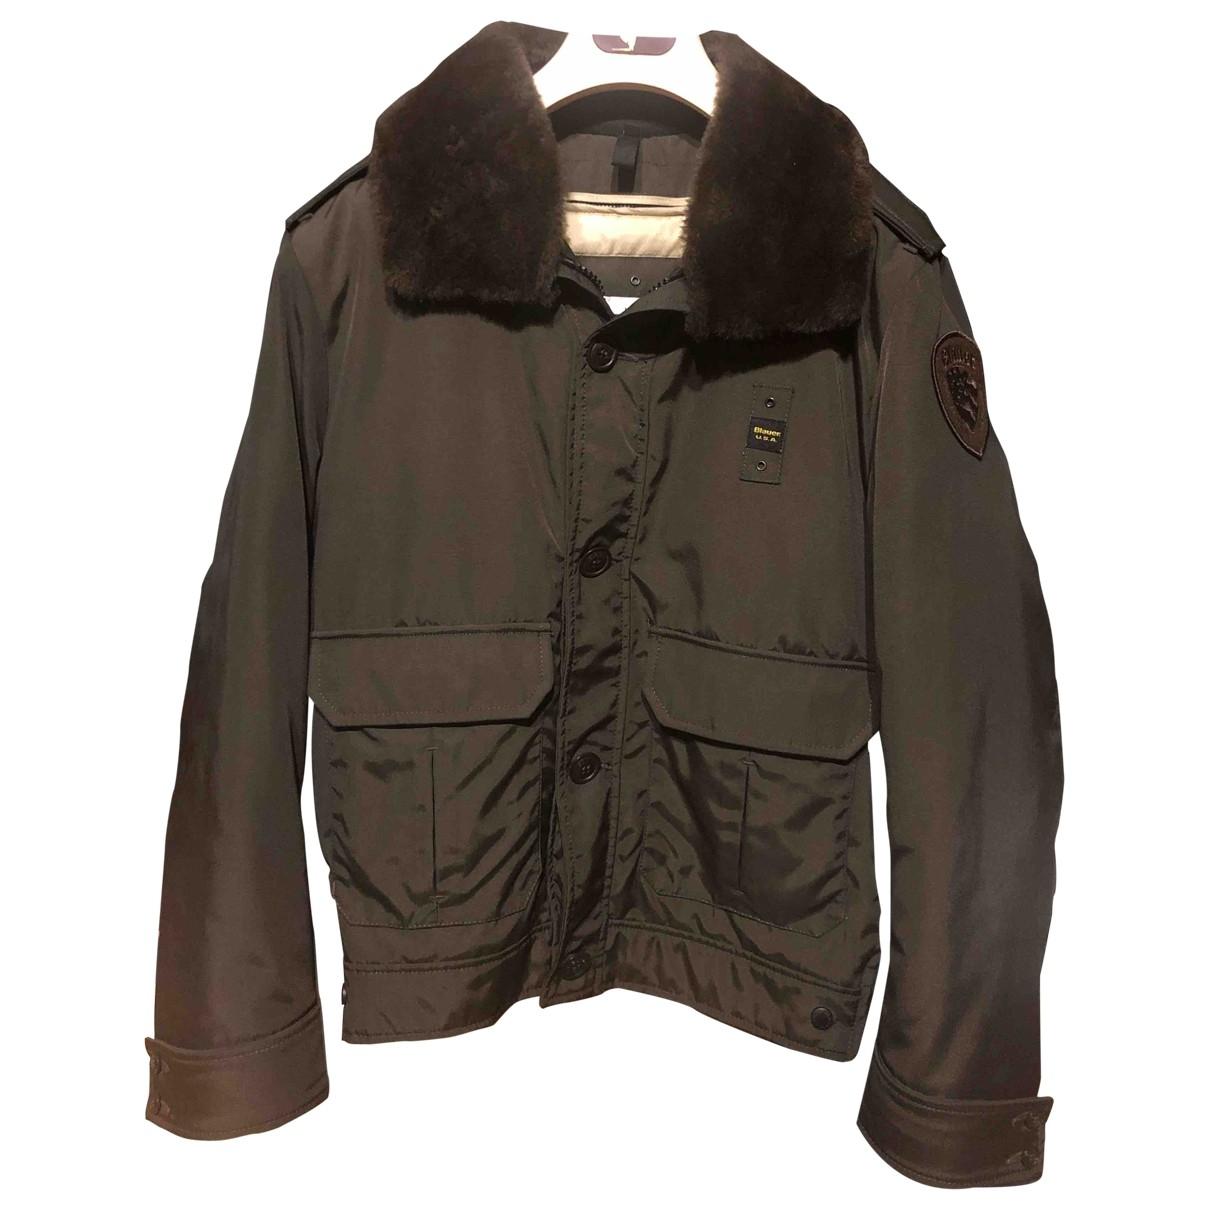 Blauer \N Brown jacket  for Men L International